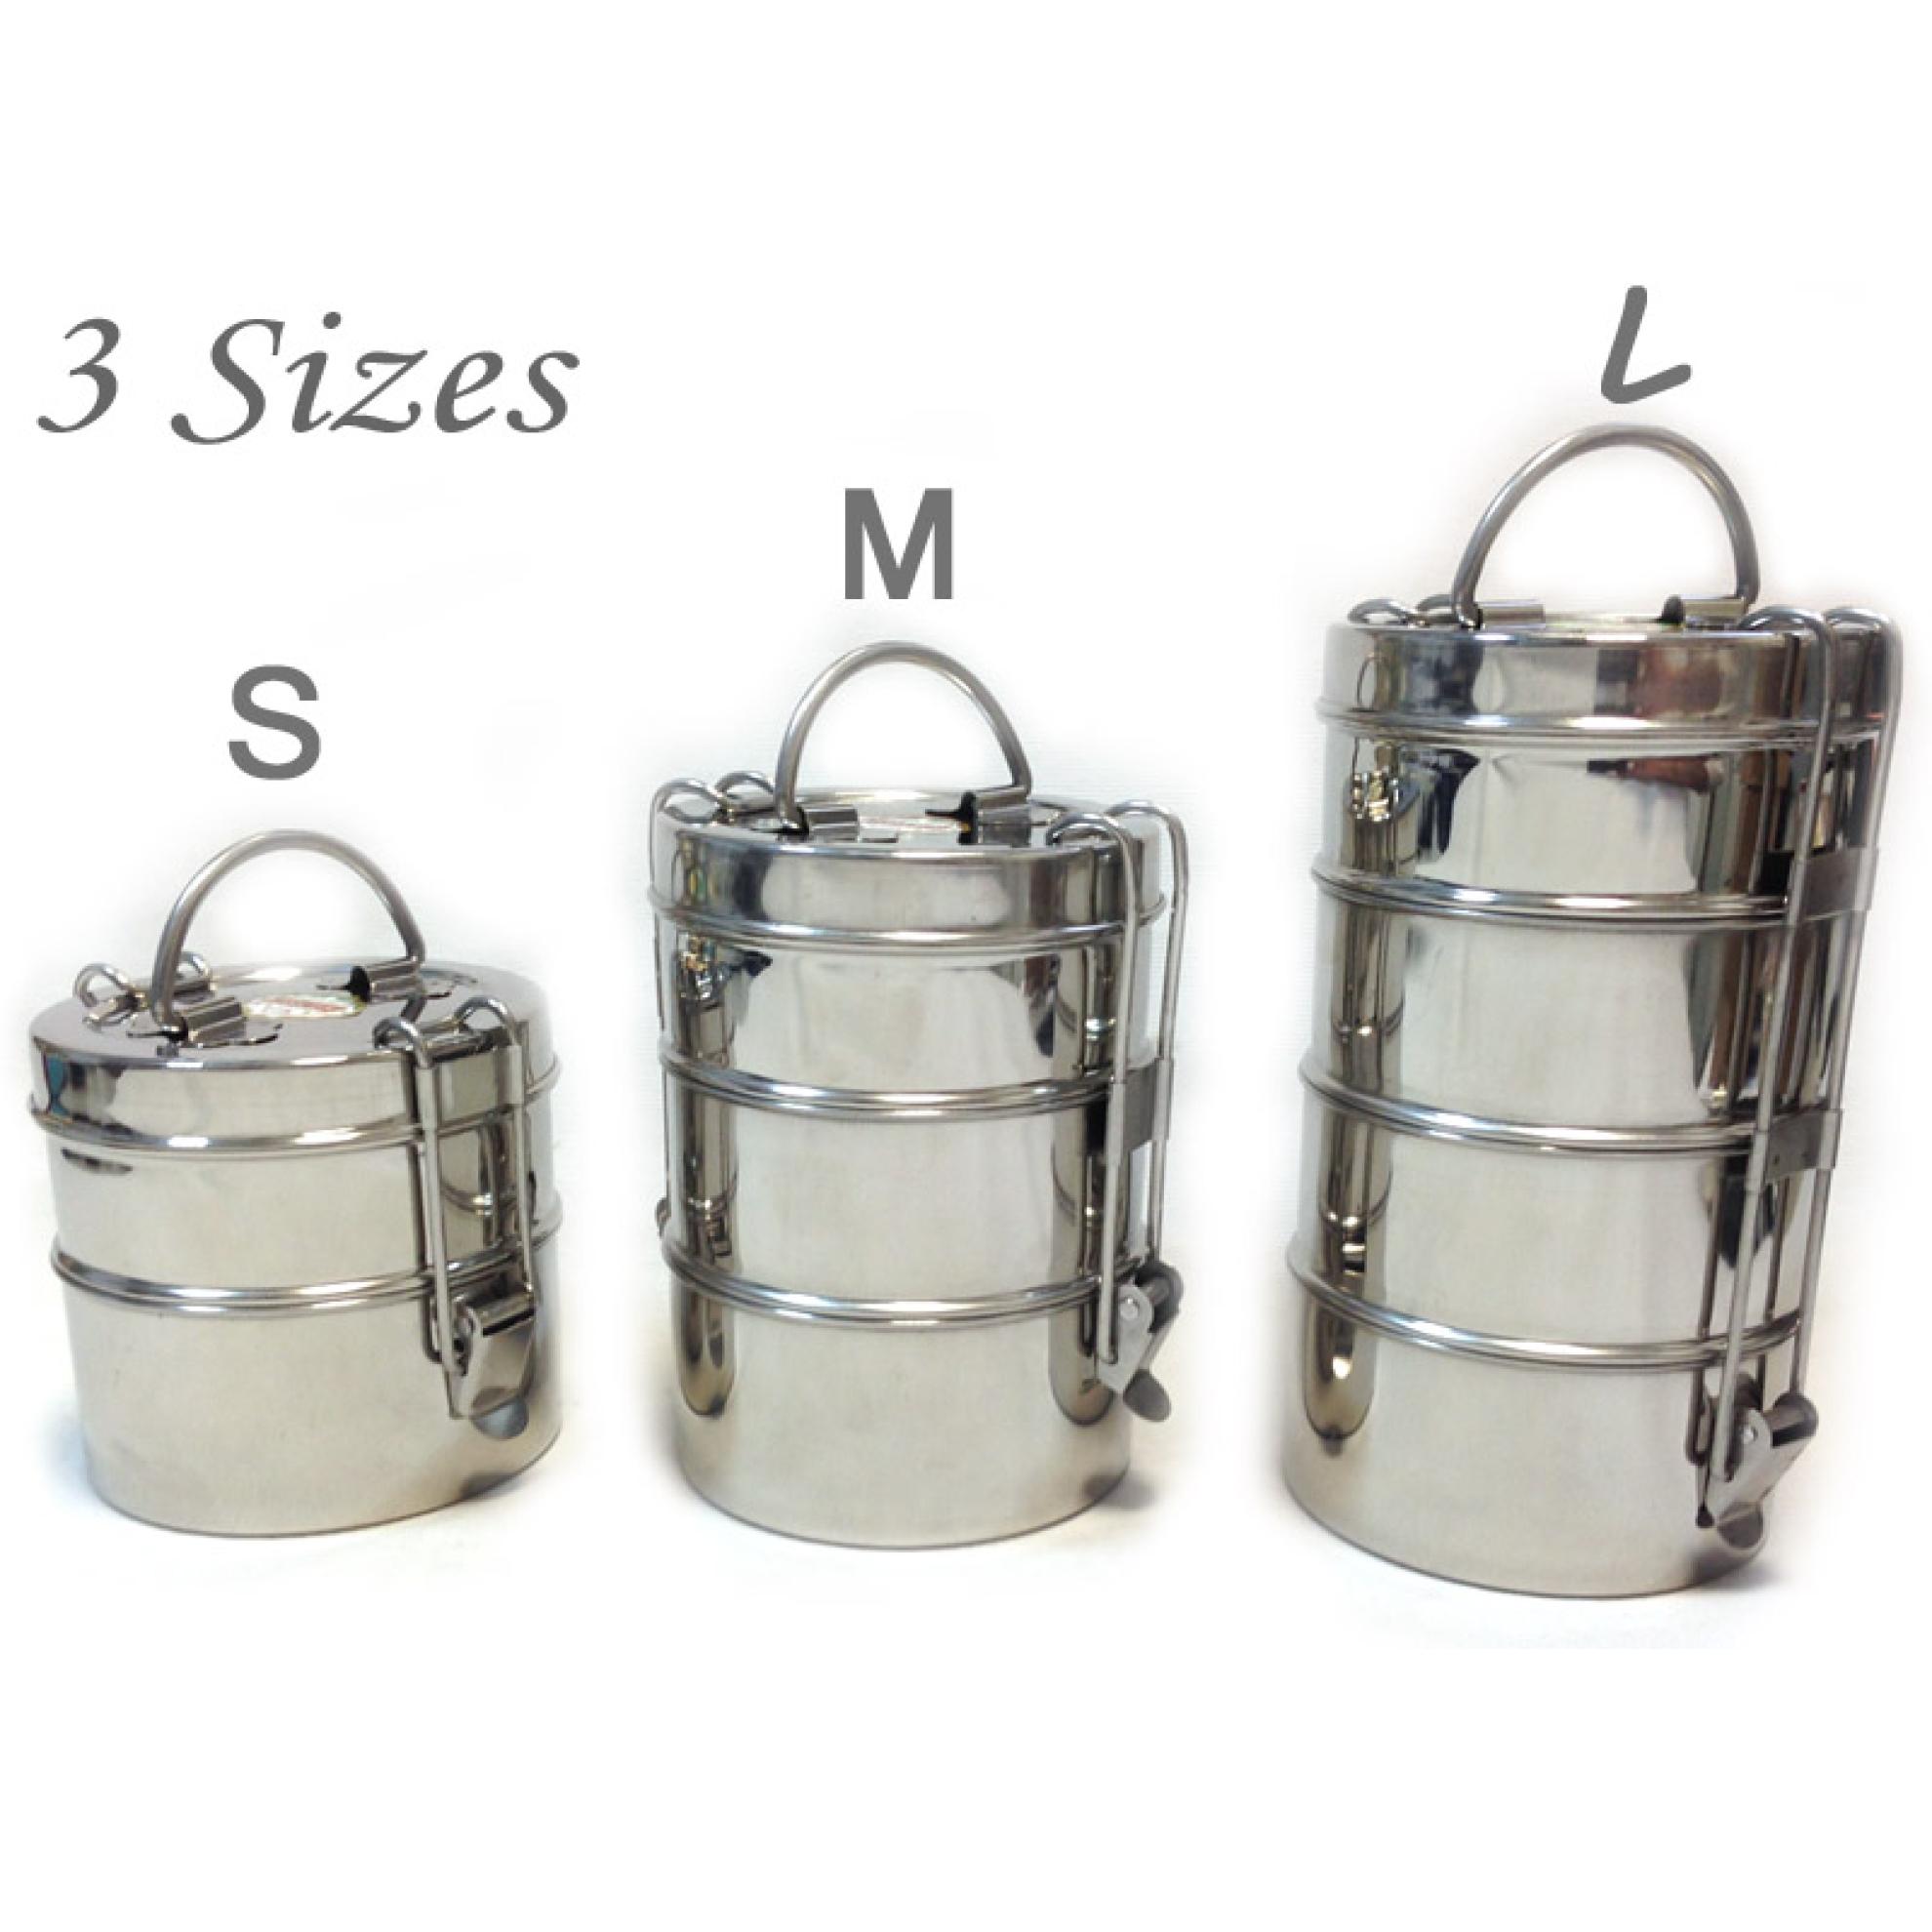 Tiffin-Box in 3 sizes